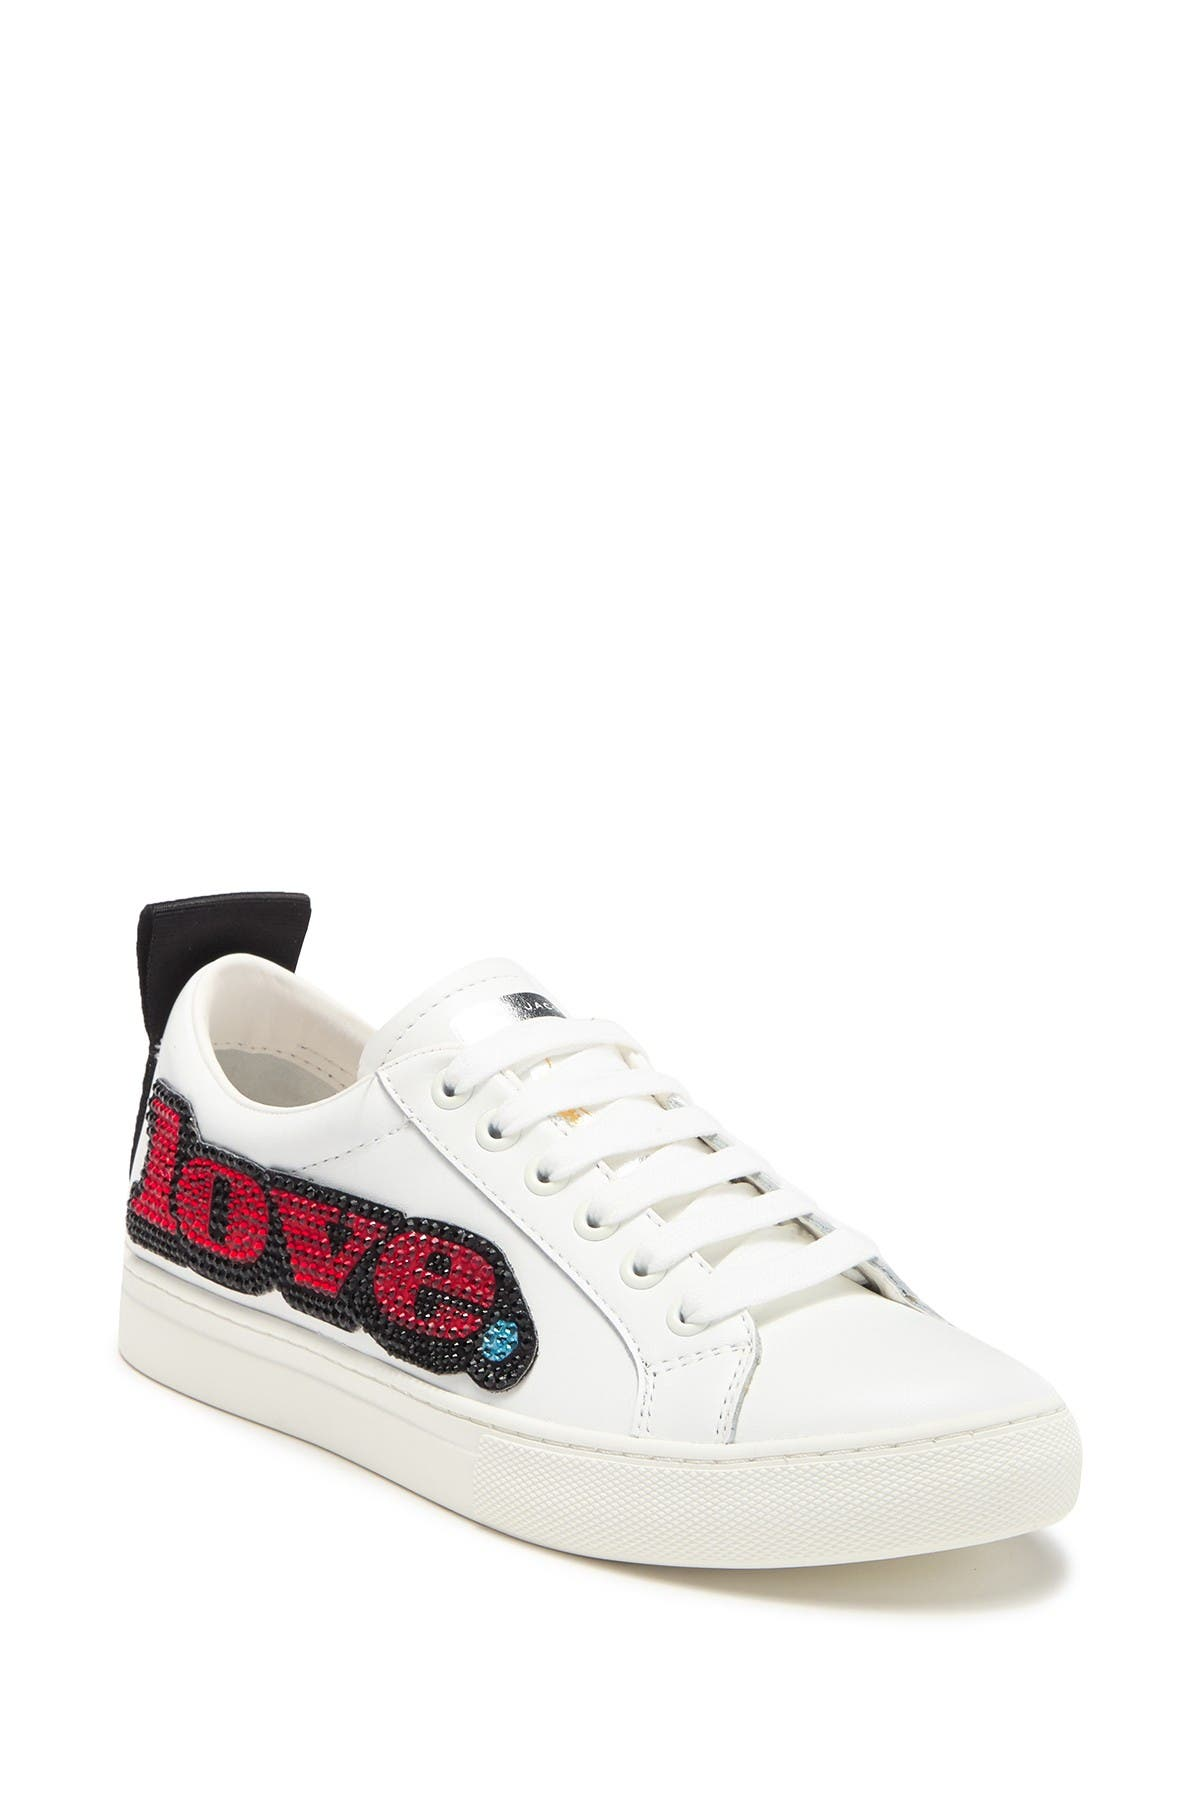 Marc Jacobs | Love Embellished Leather